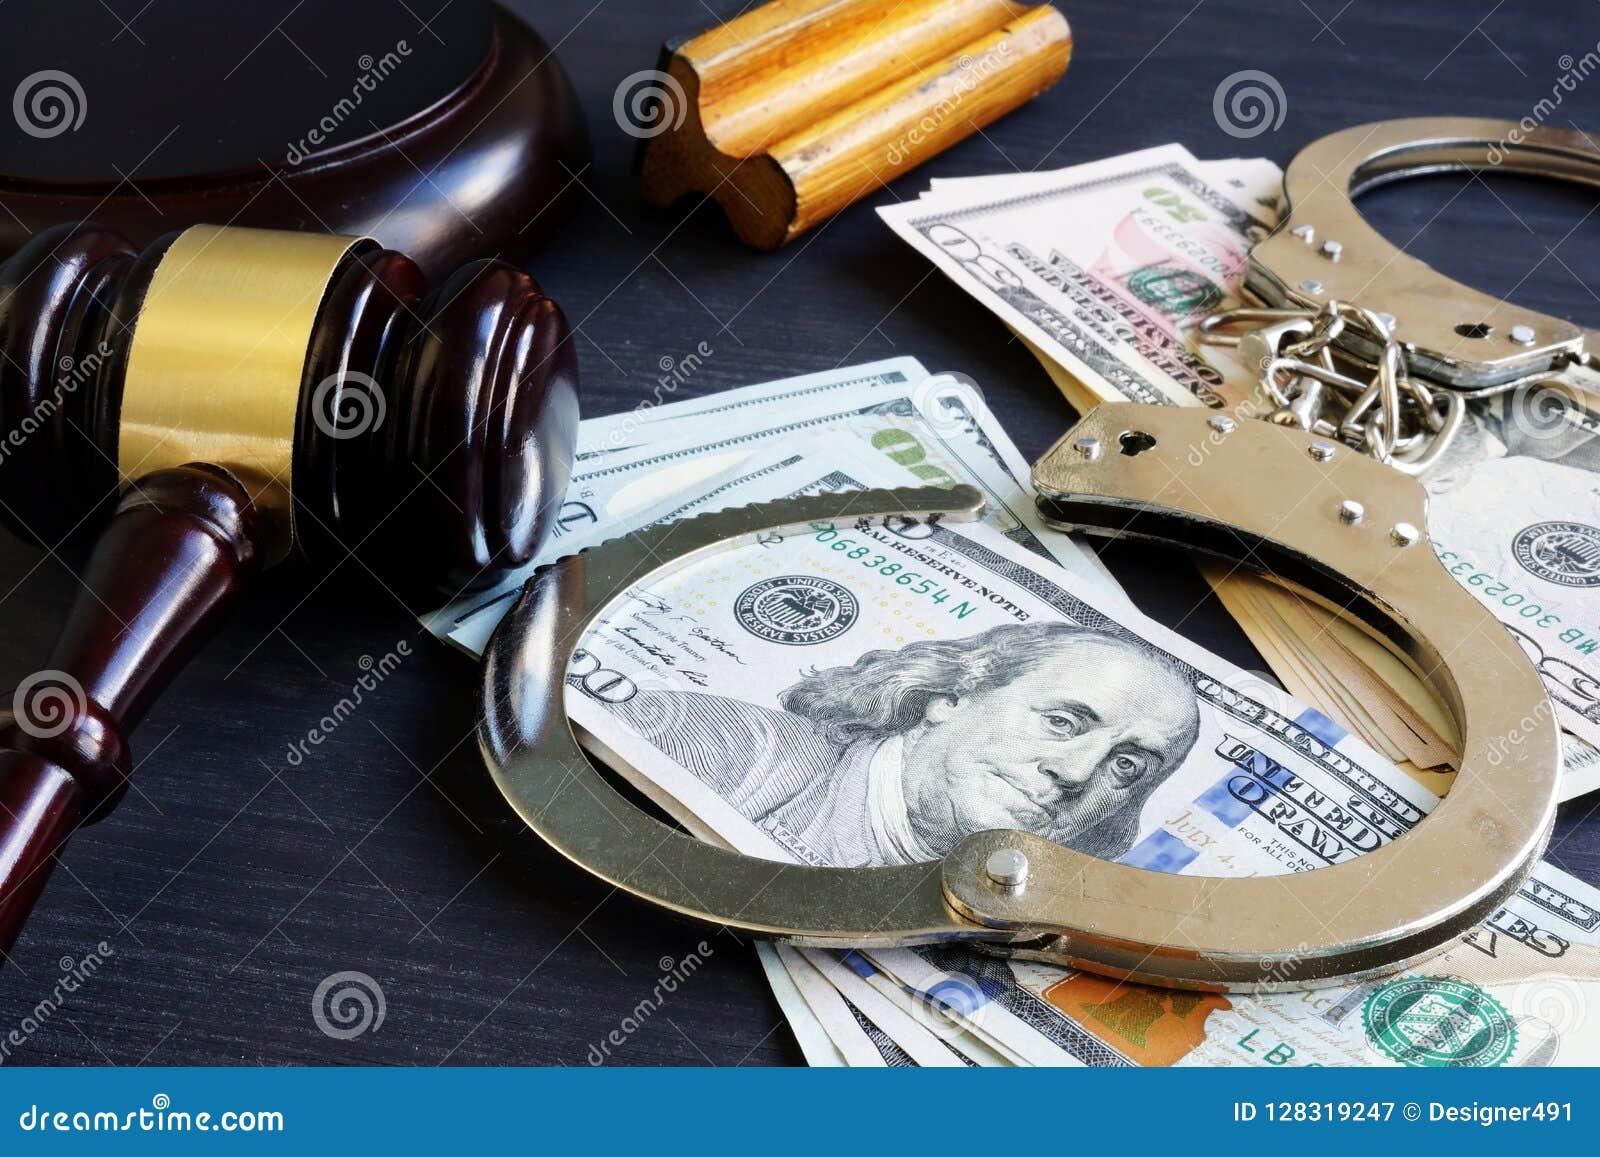 Borgtochtband corruptie Hamer, handcuffs en geld